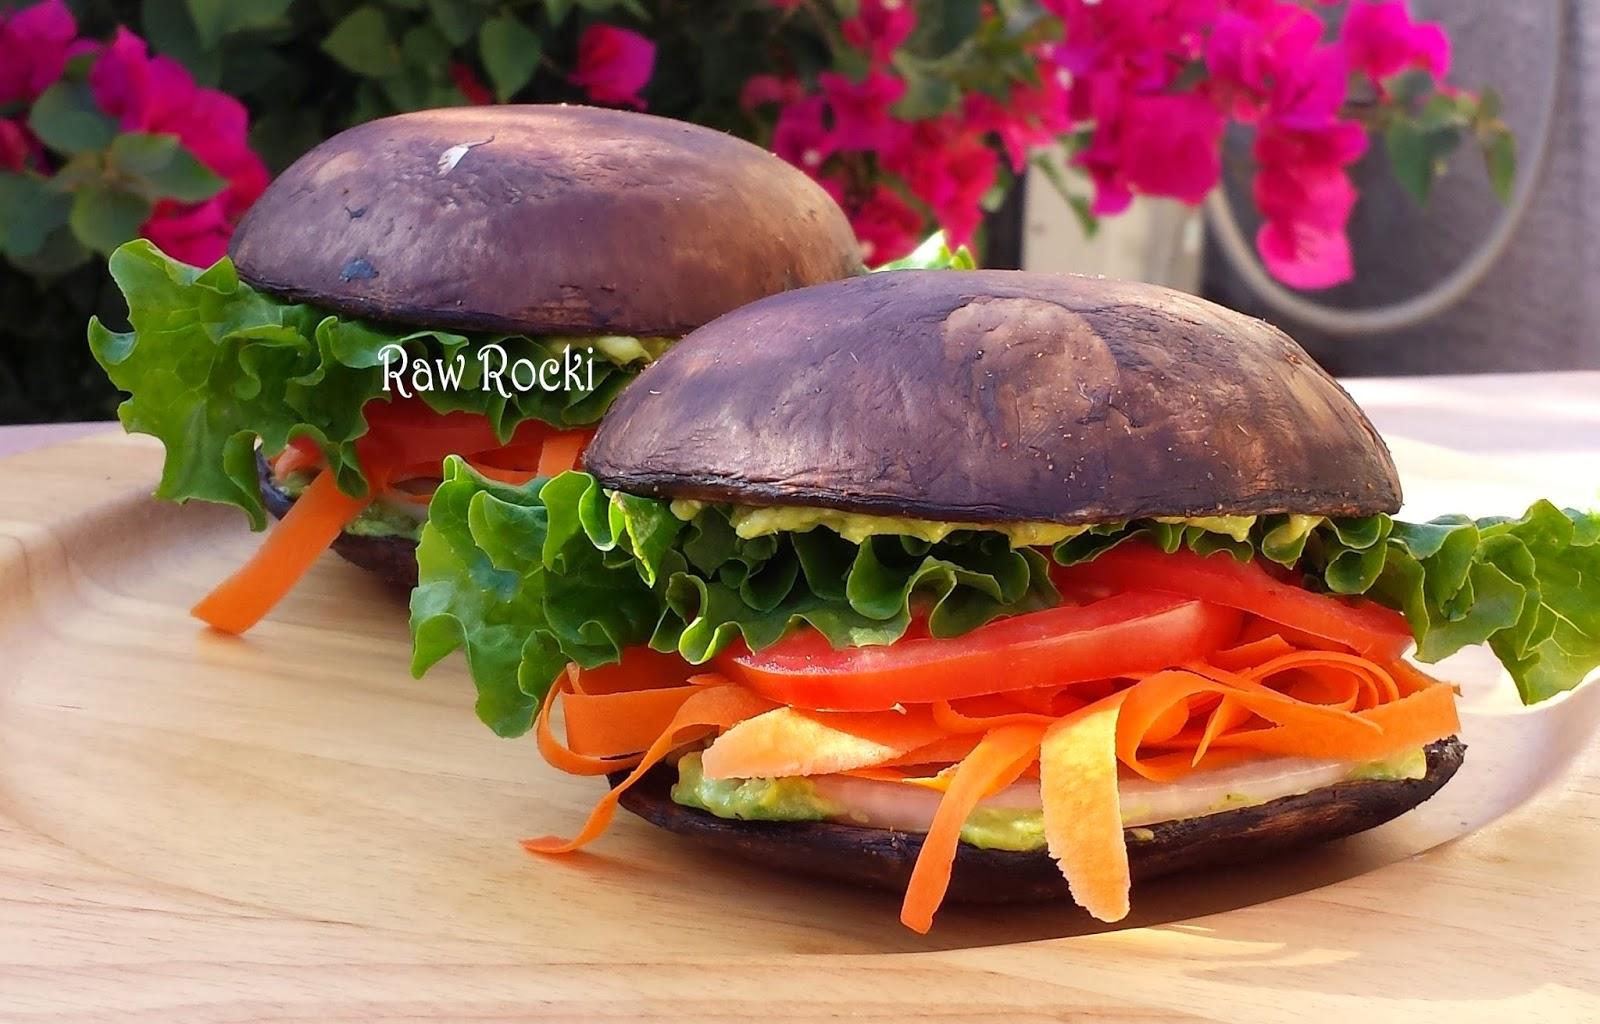 Raw vegan recipes by rocki raw vegan veggie burgers raw vegan veggie burgers forumfinder Images